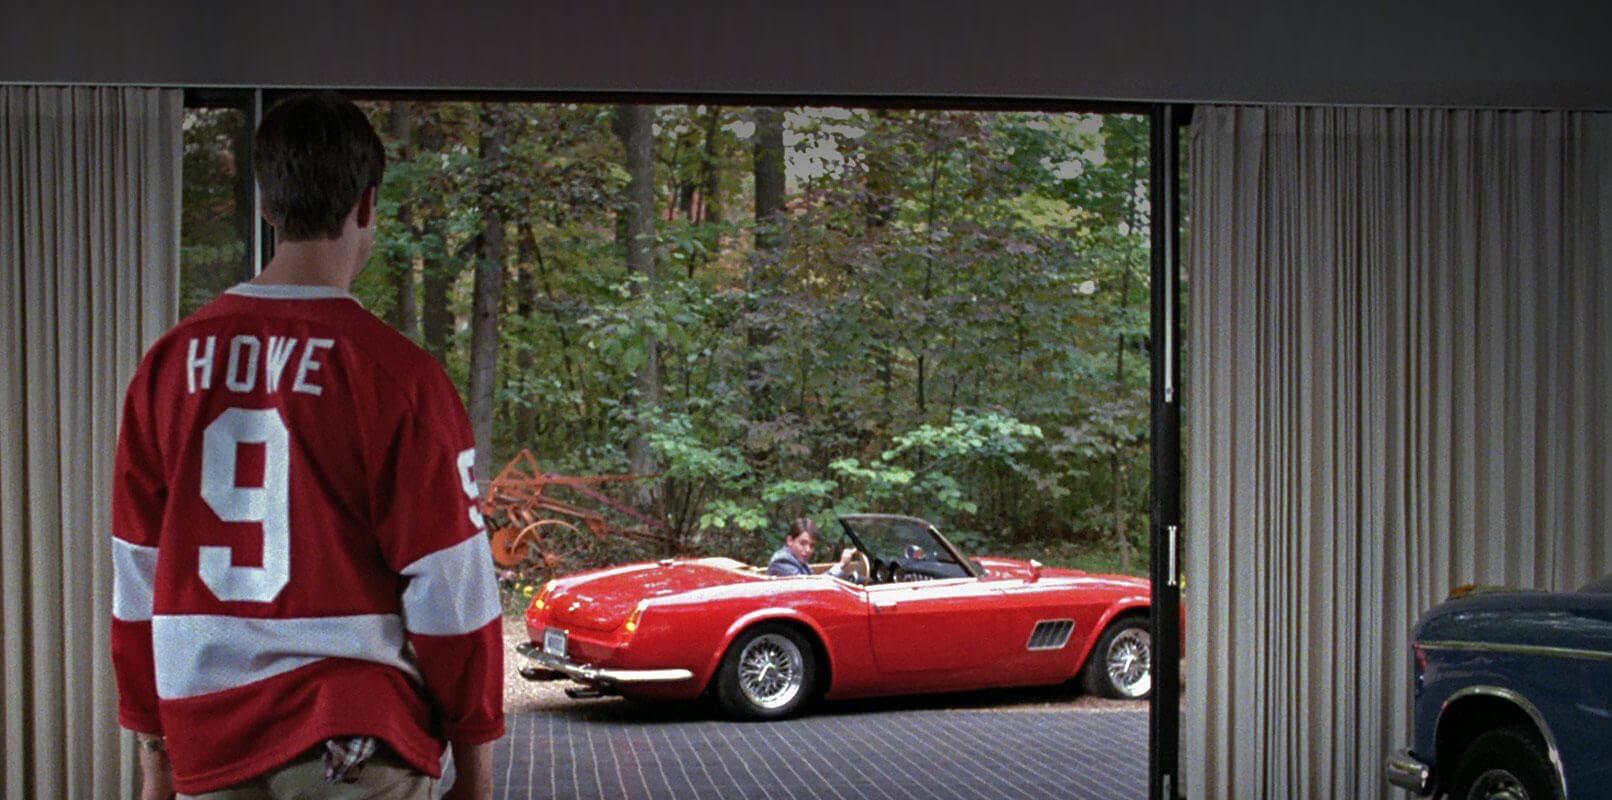 Ferris Bueller's Day Off - Visual Metaphor Examples